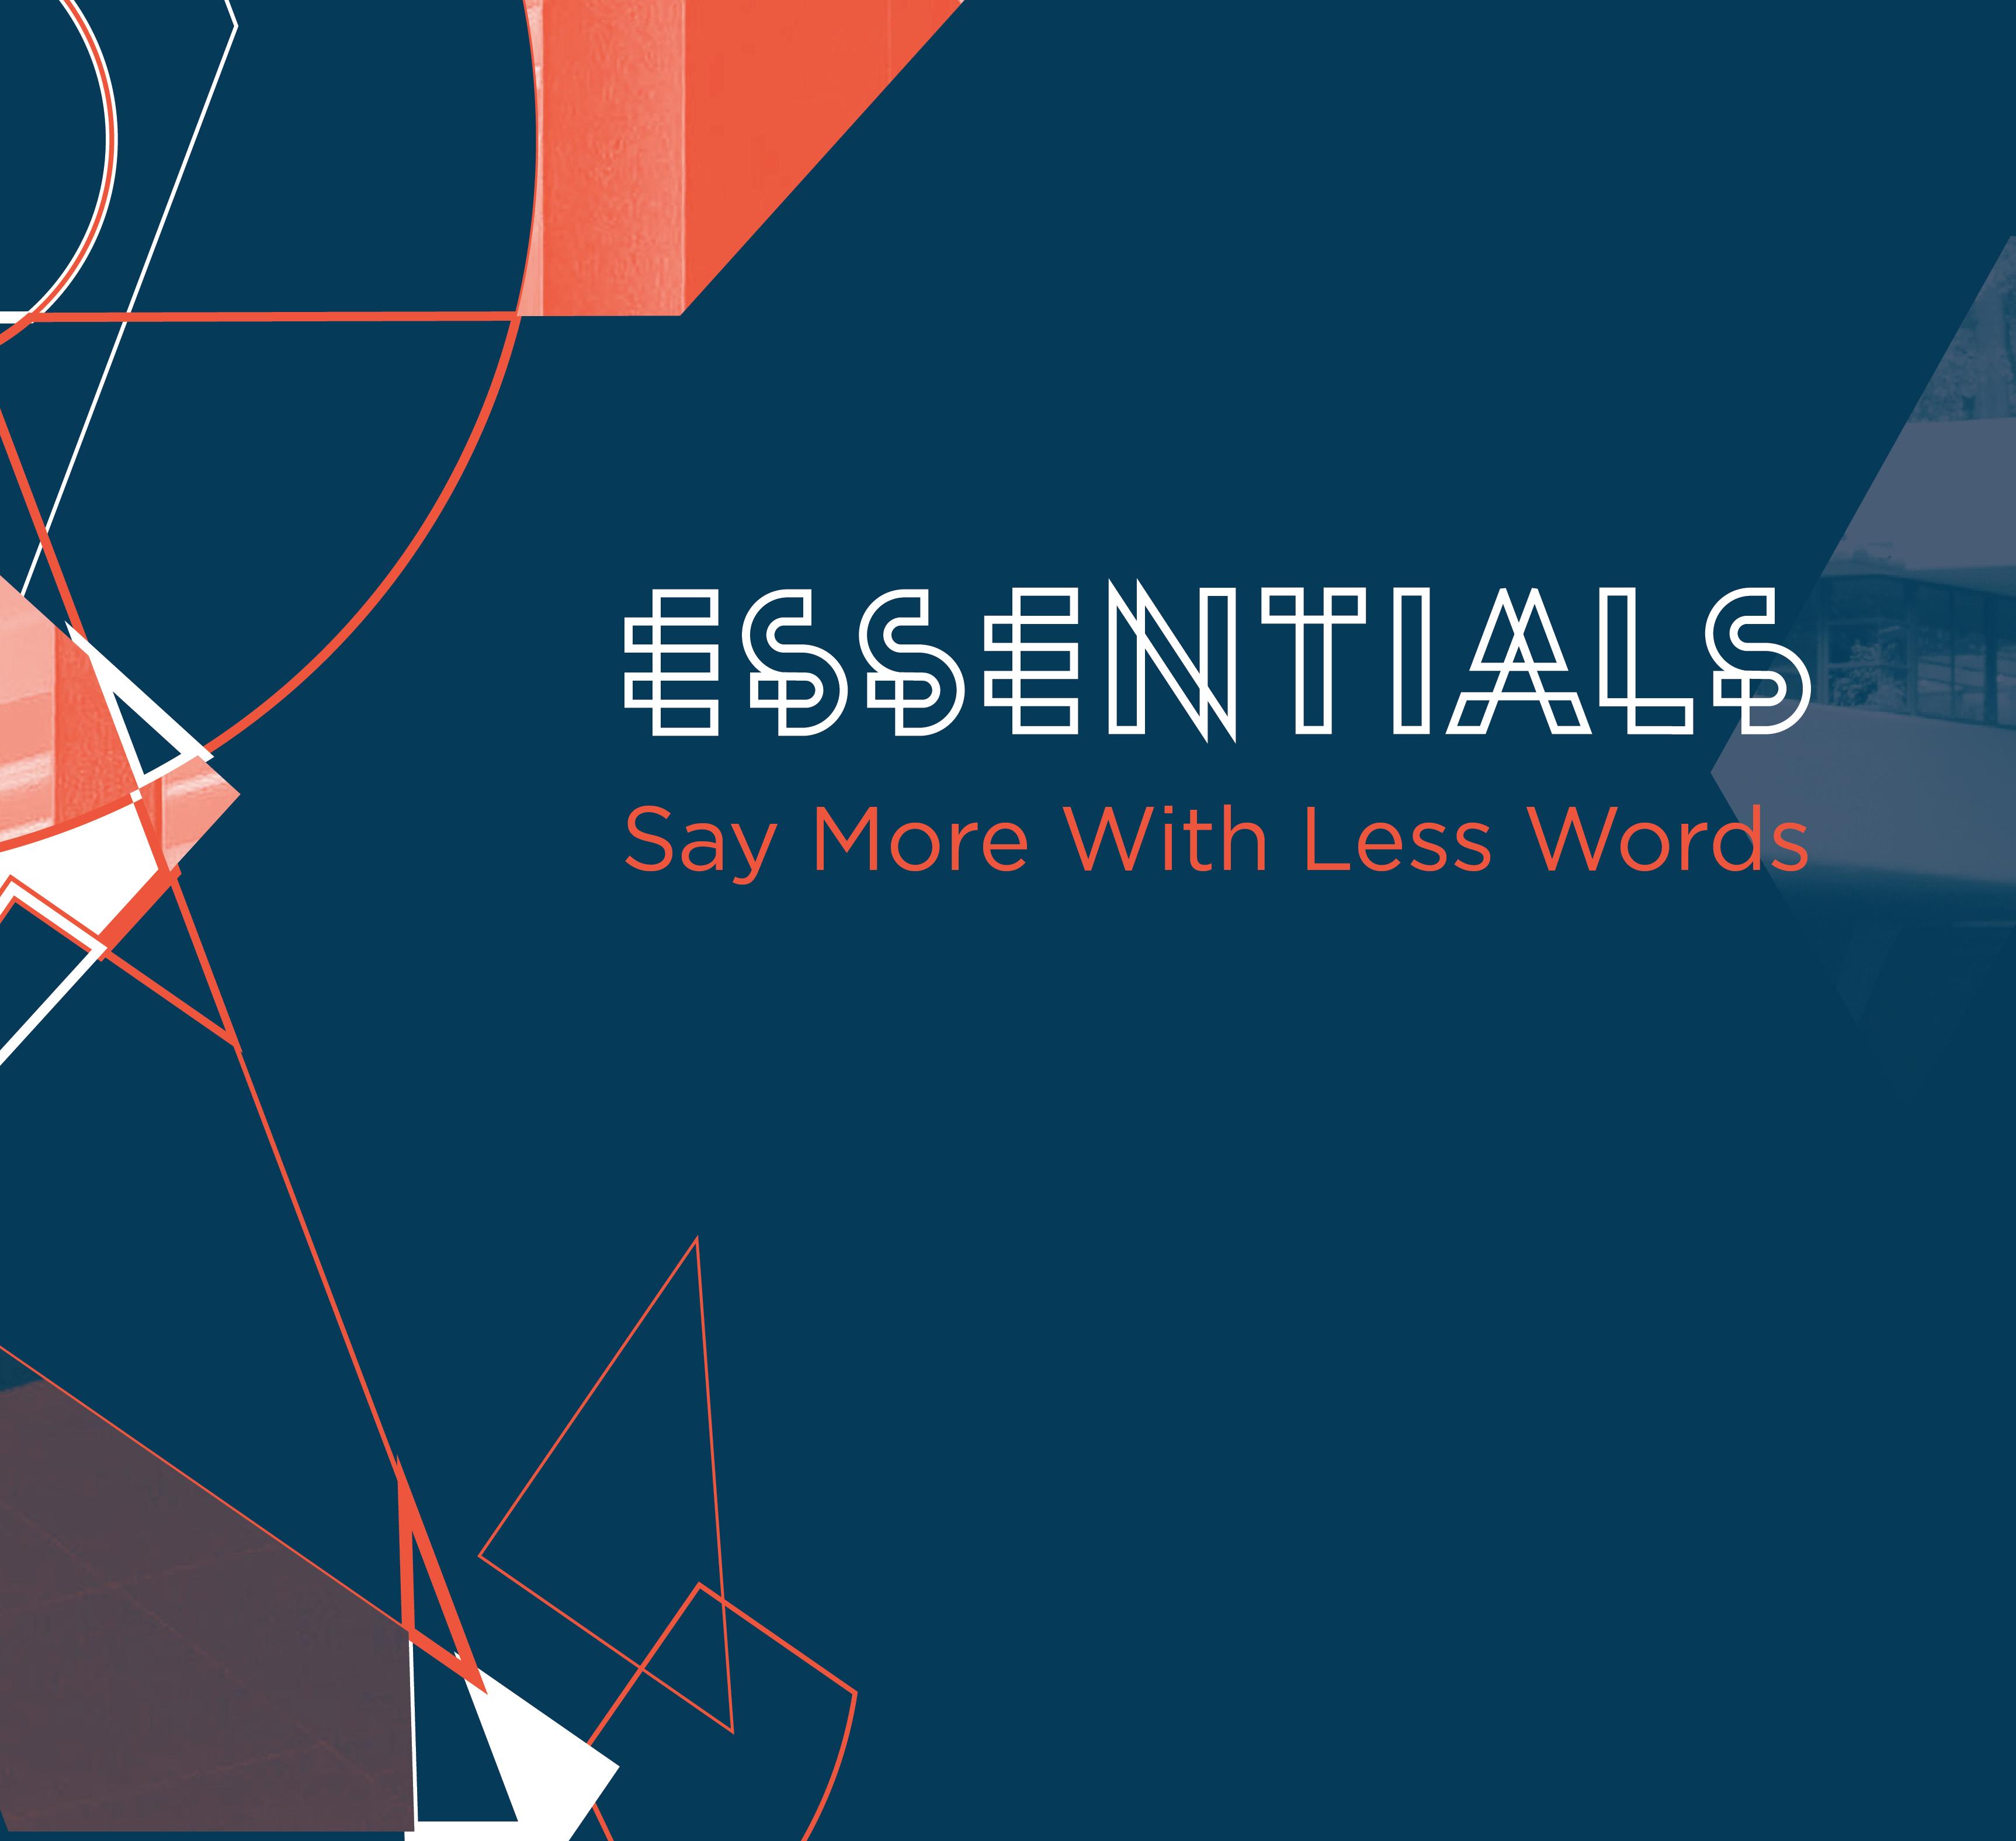 Essentials_covver-11